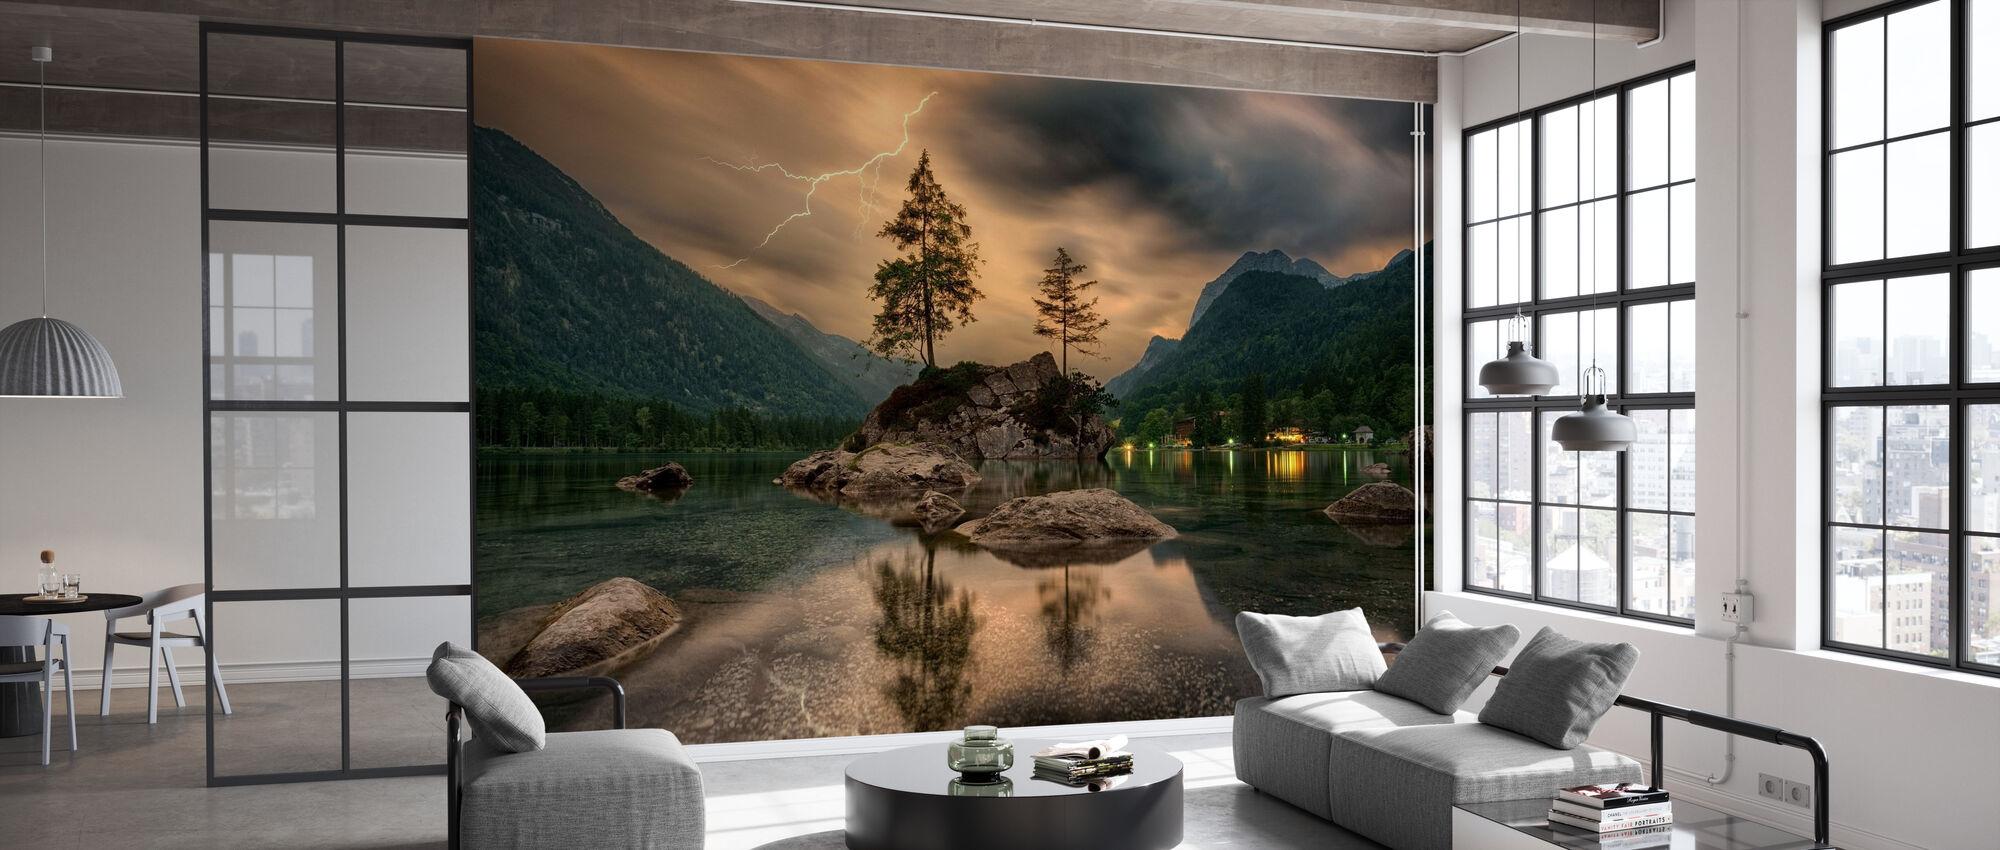 Lake Tree - Wallpaper - Office